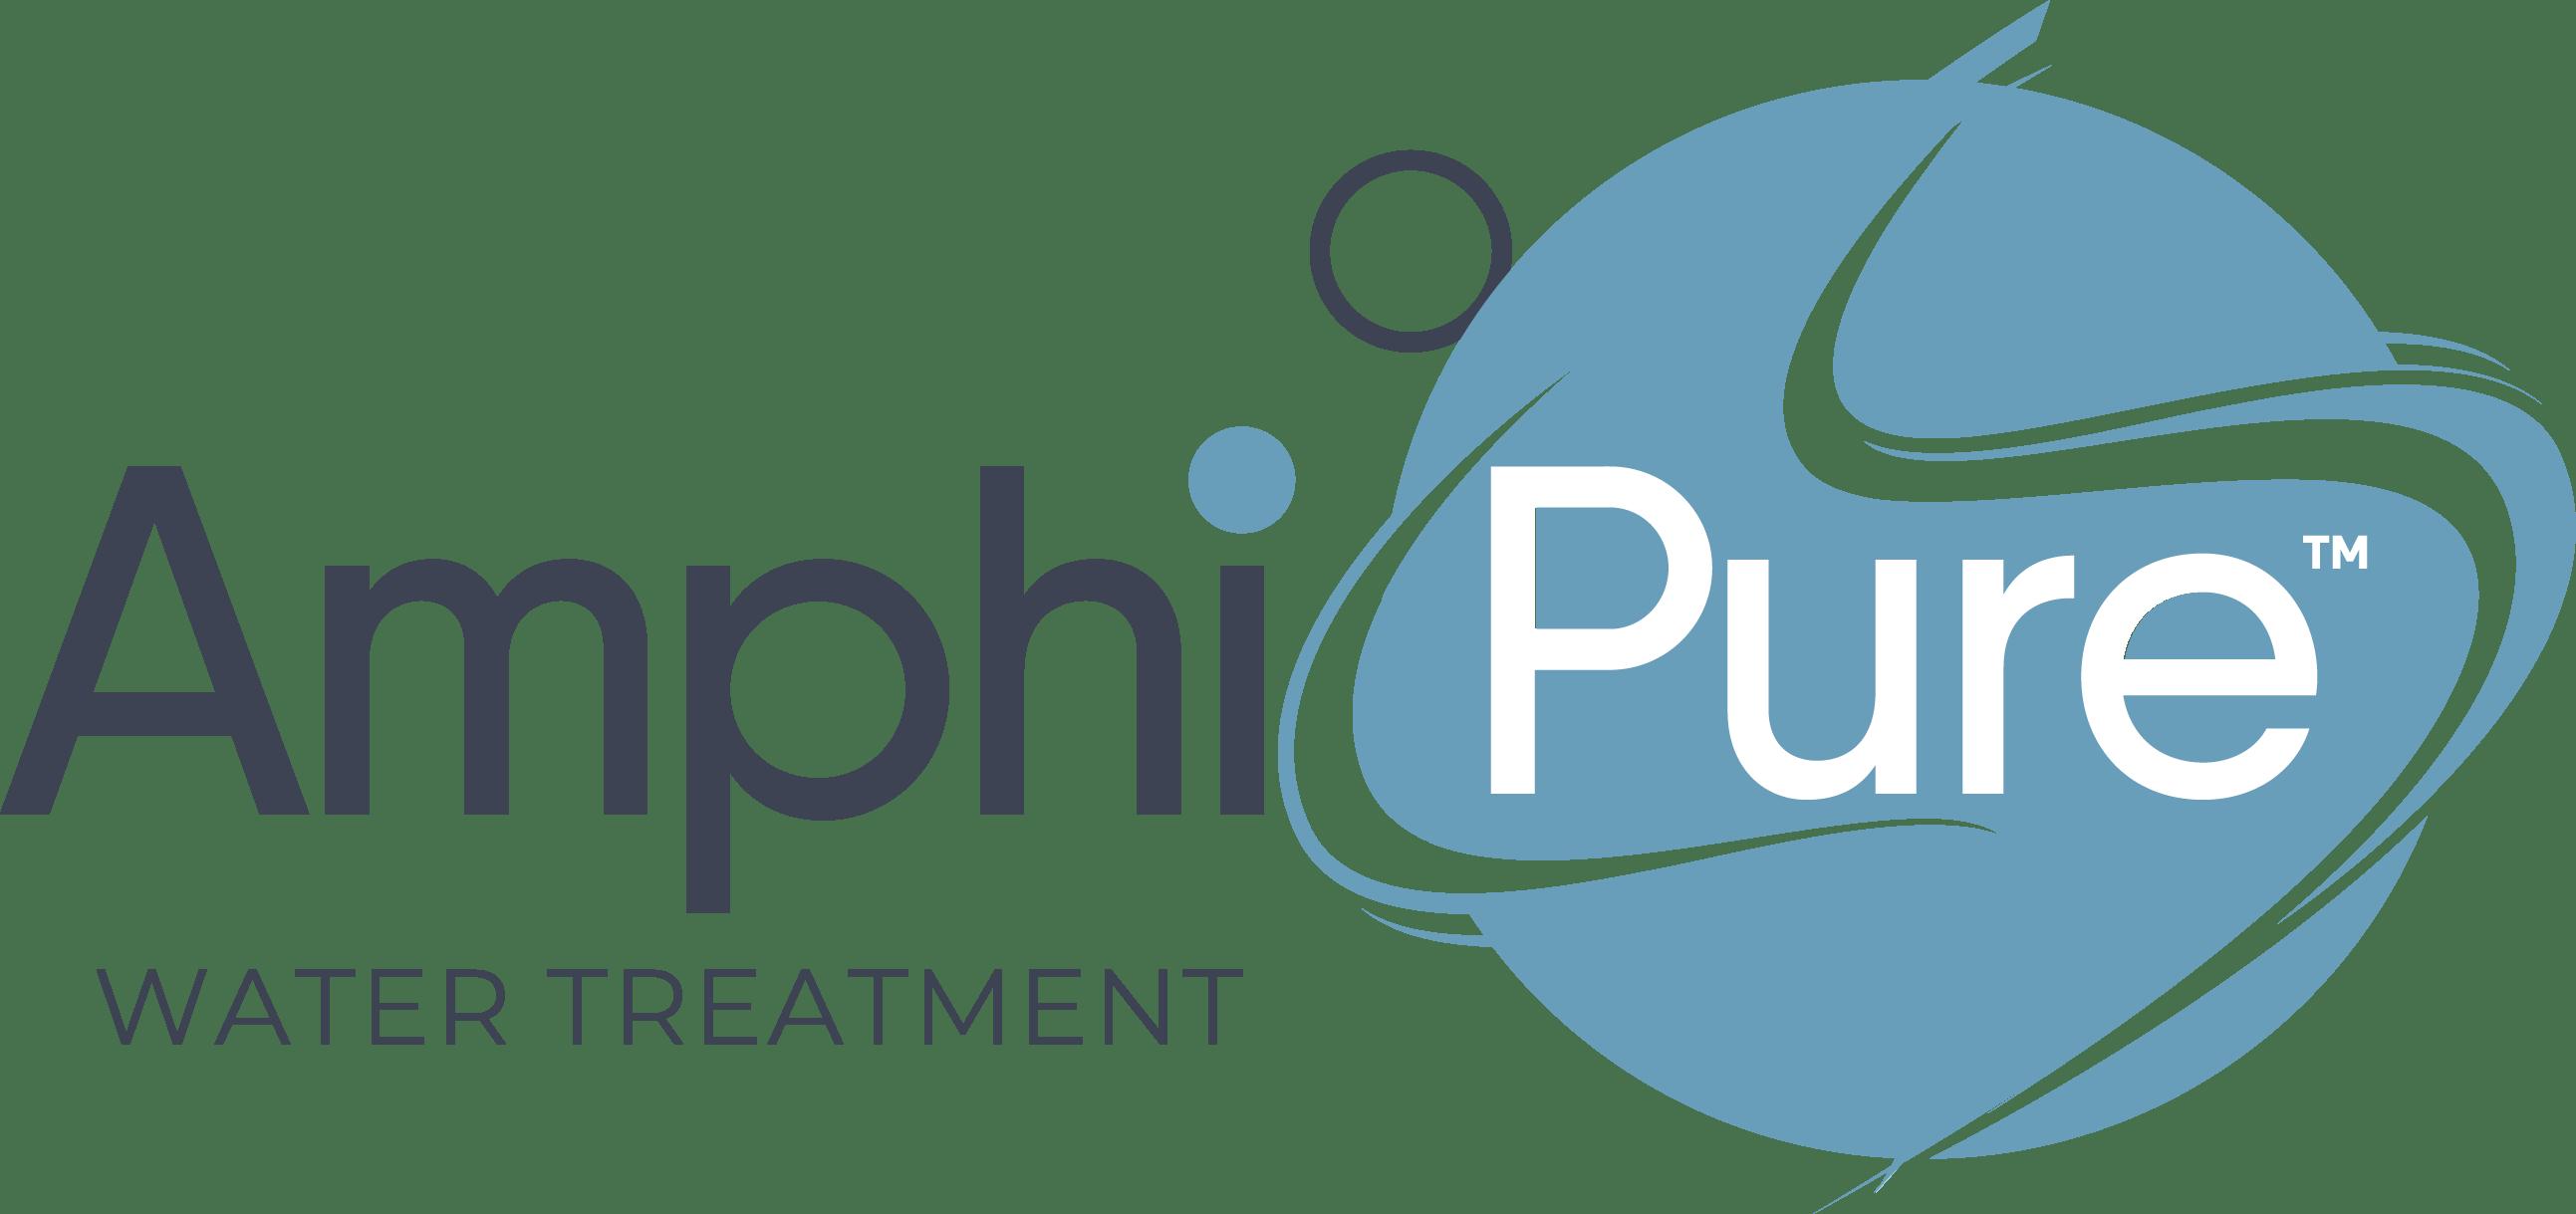 Amphipure logo